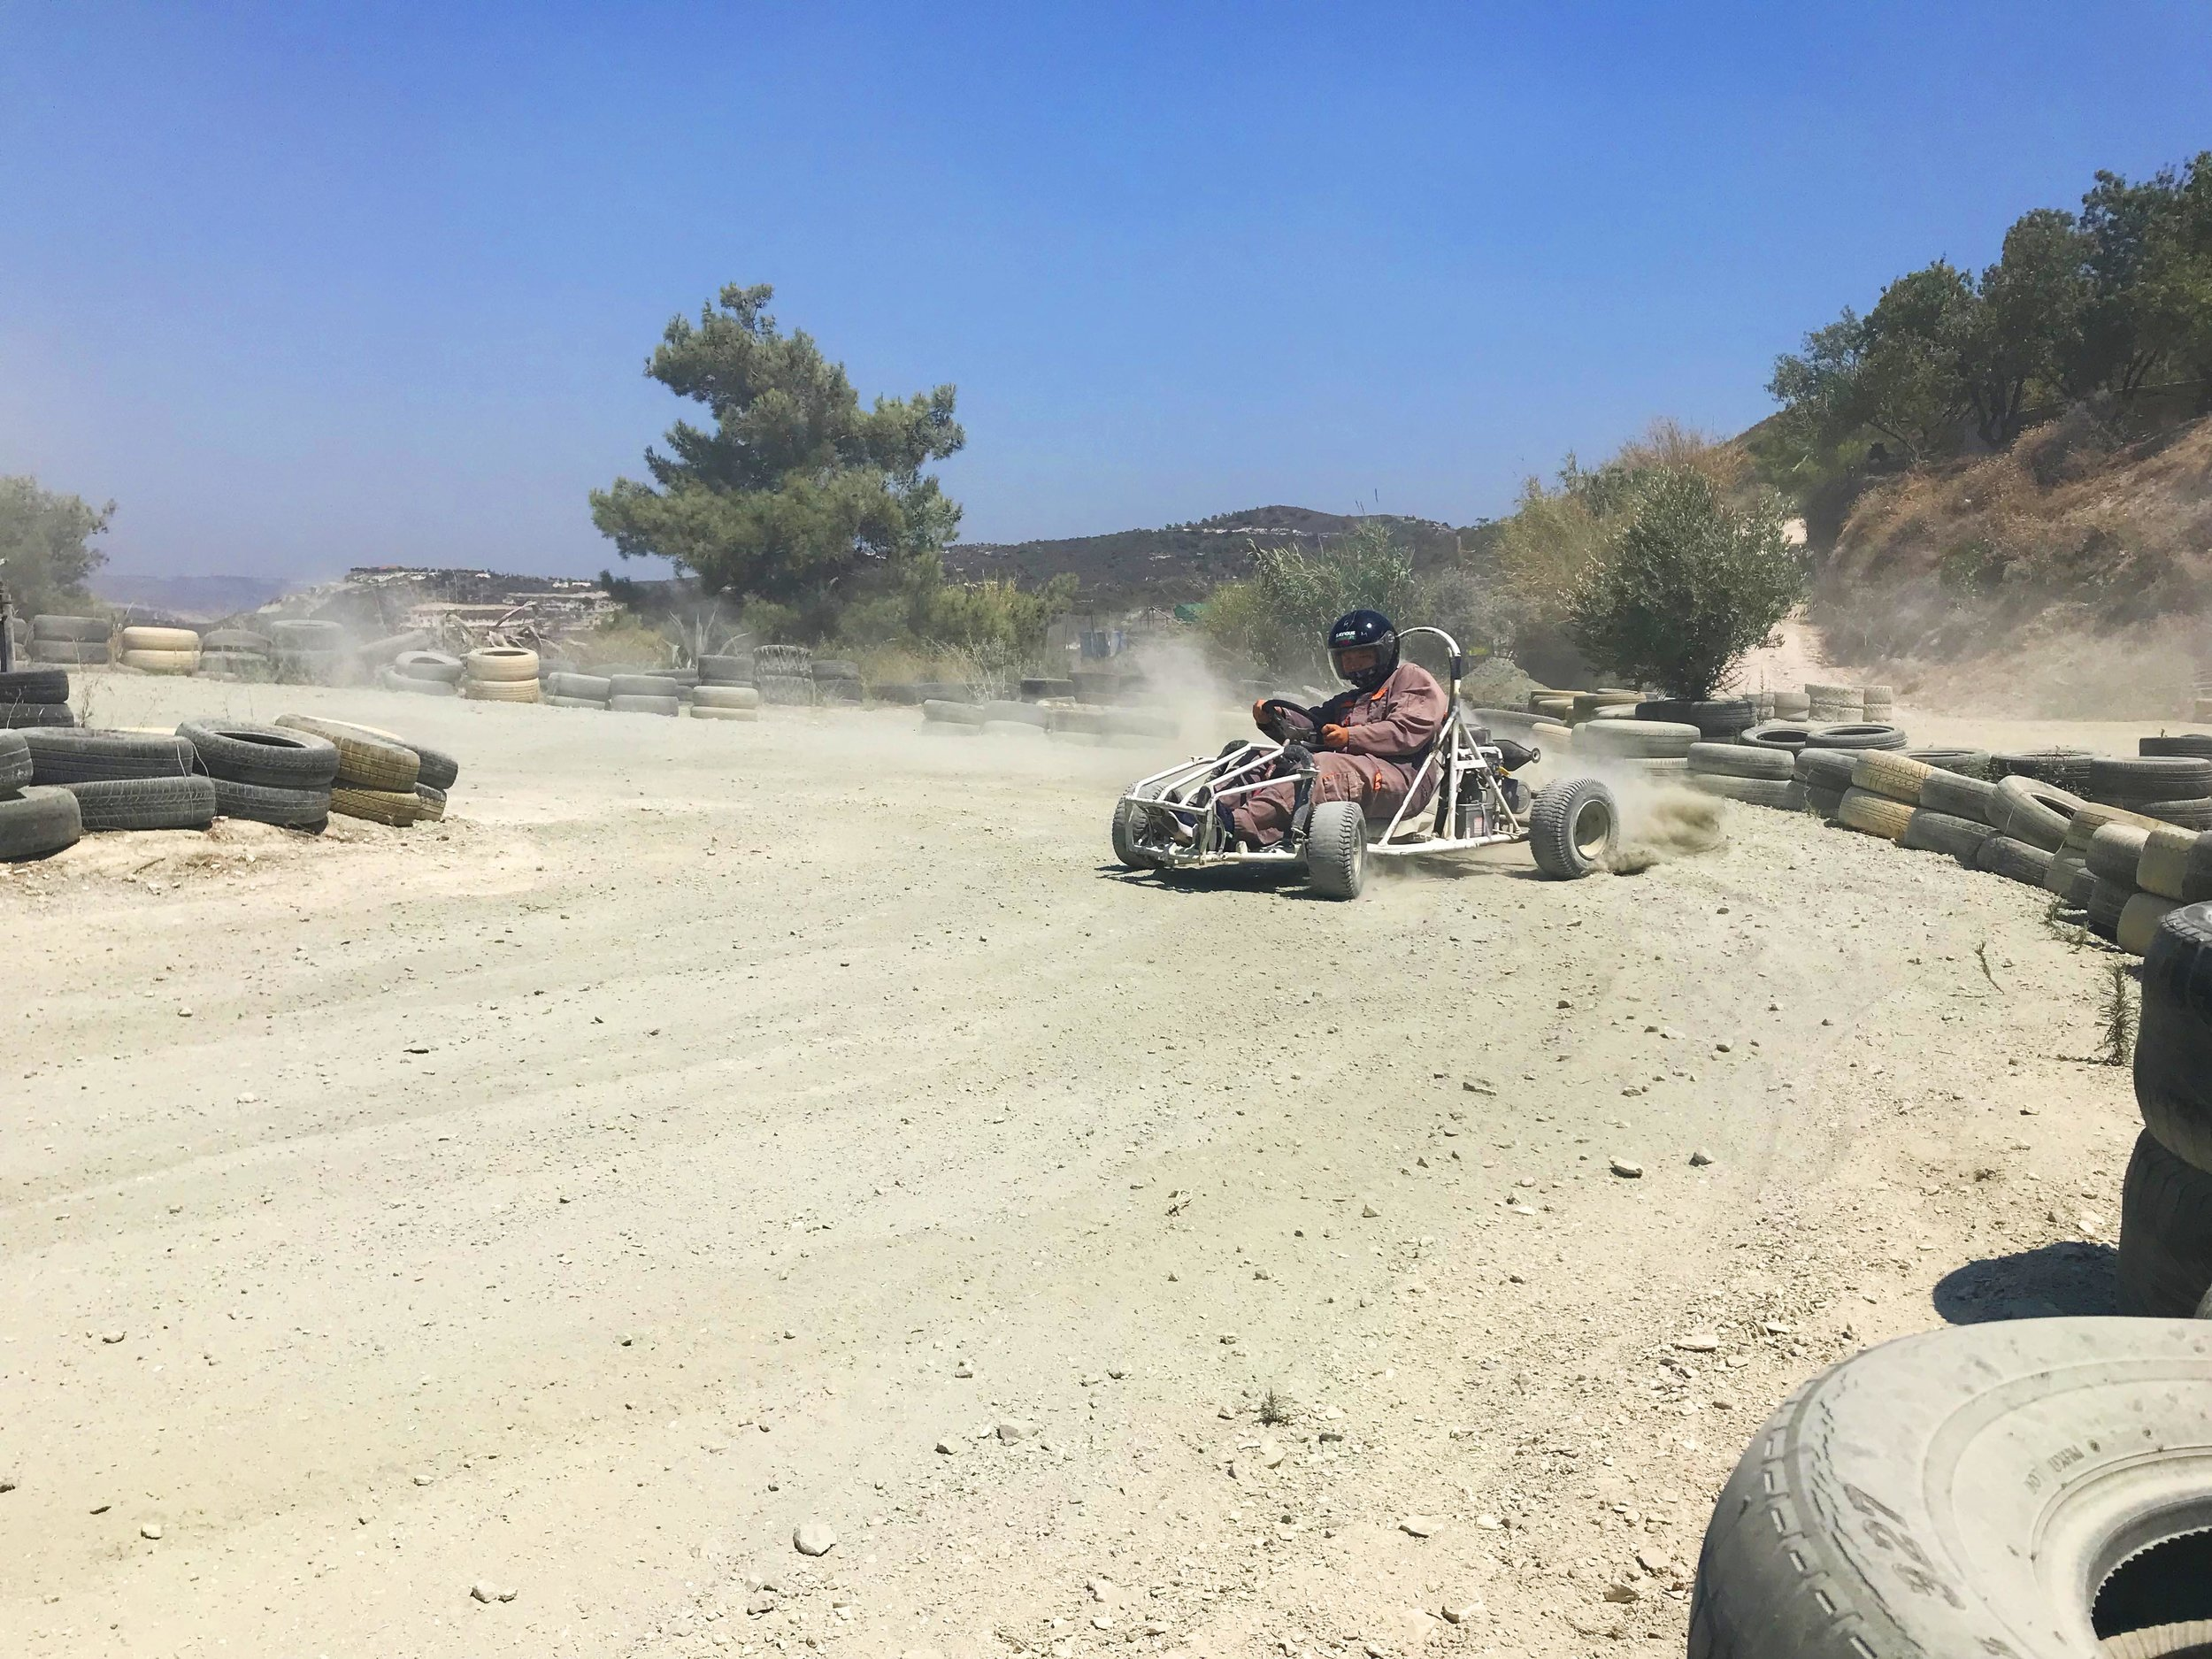 Drift Go-karting - 5 minutes each